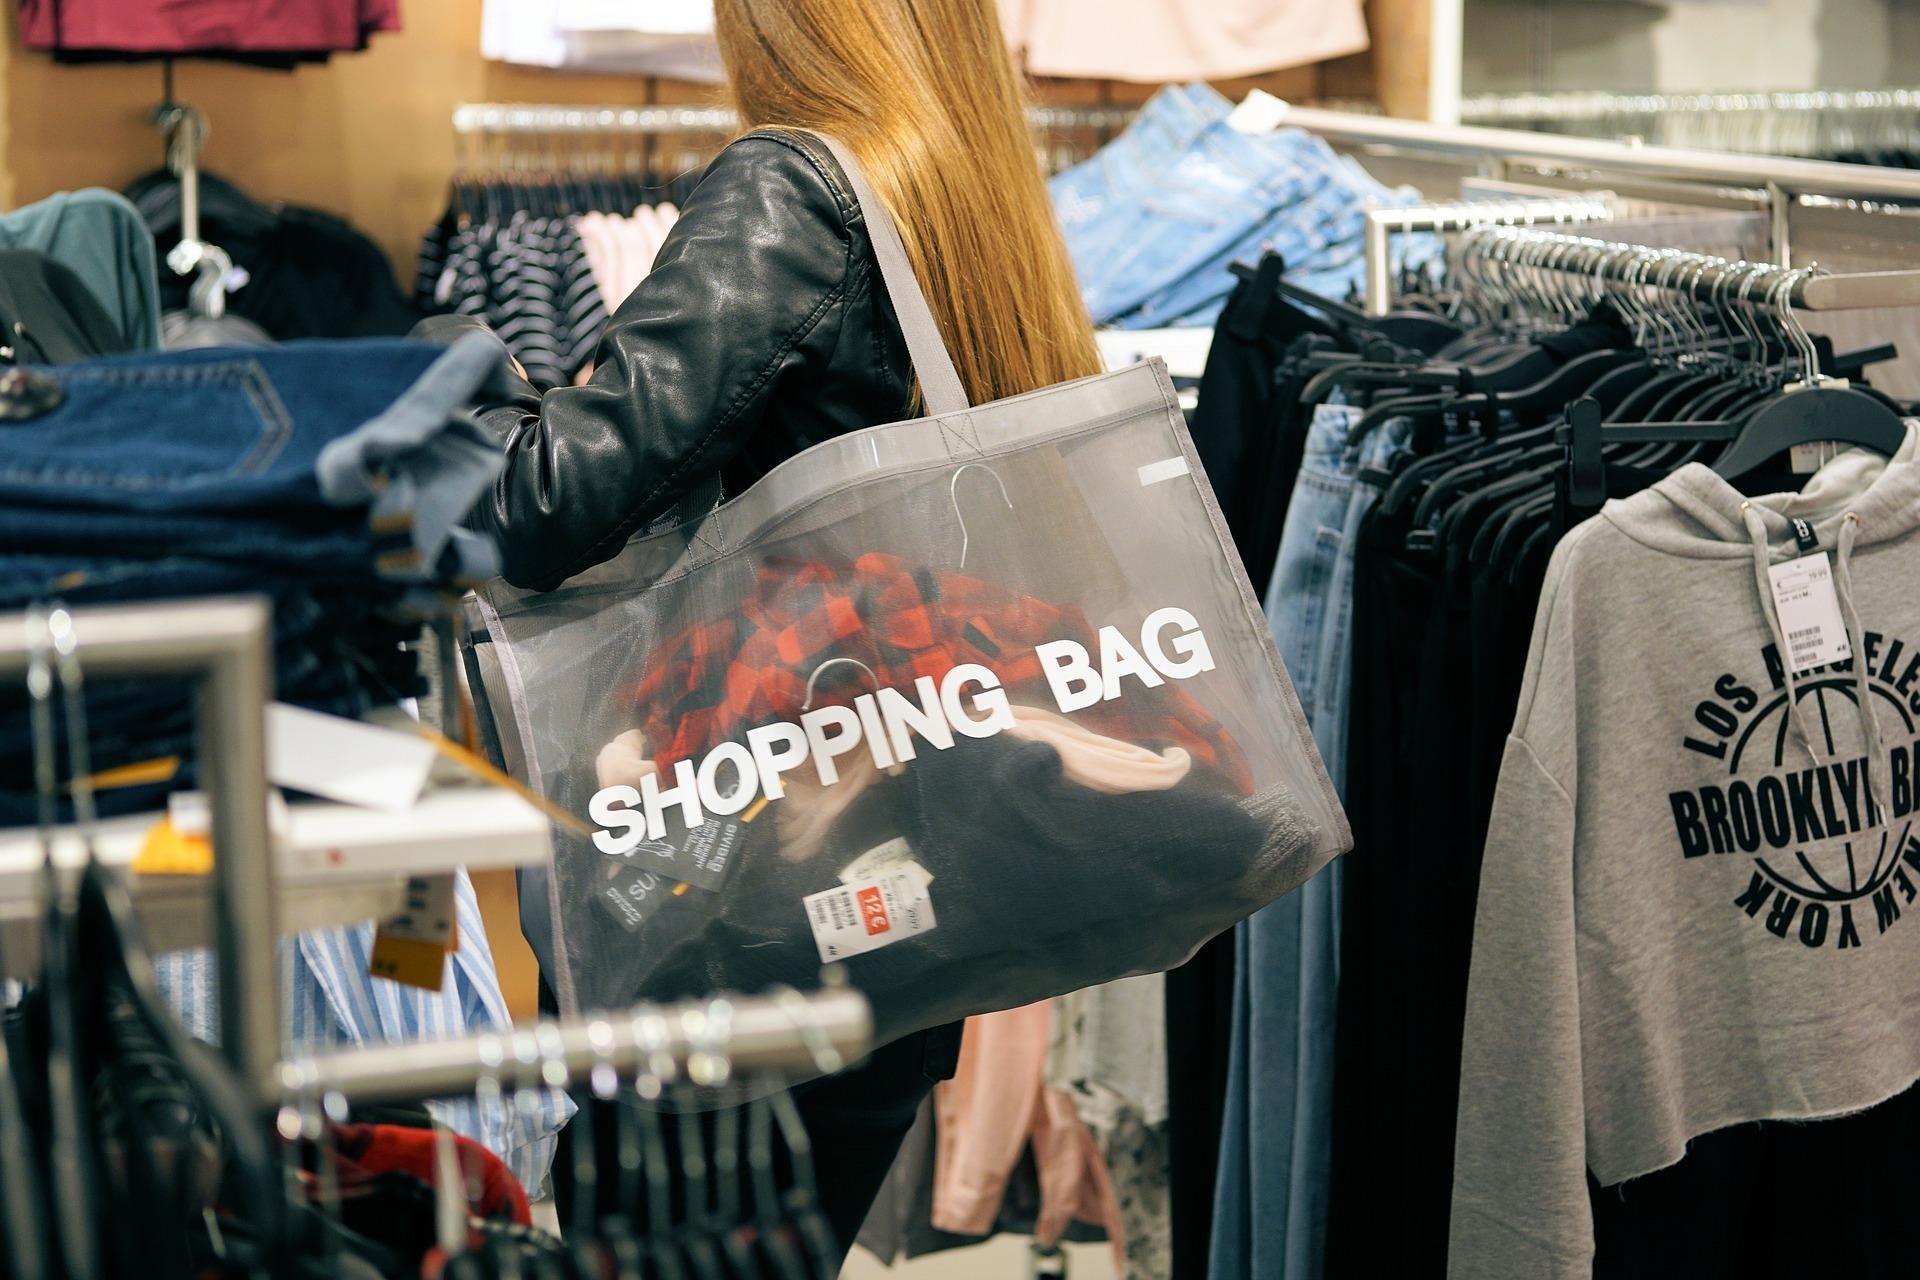 Shopping - 2163323 - 1920